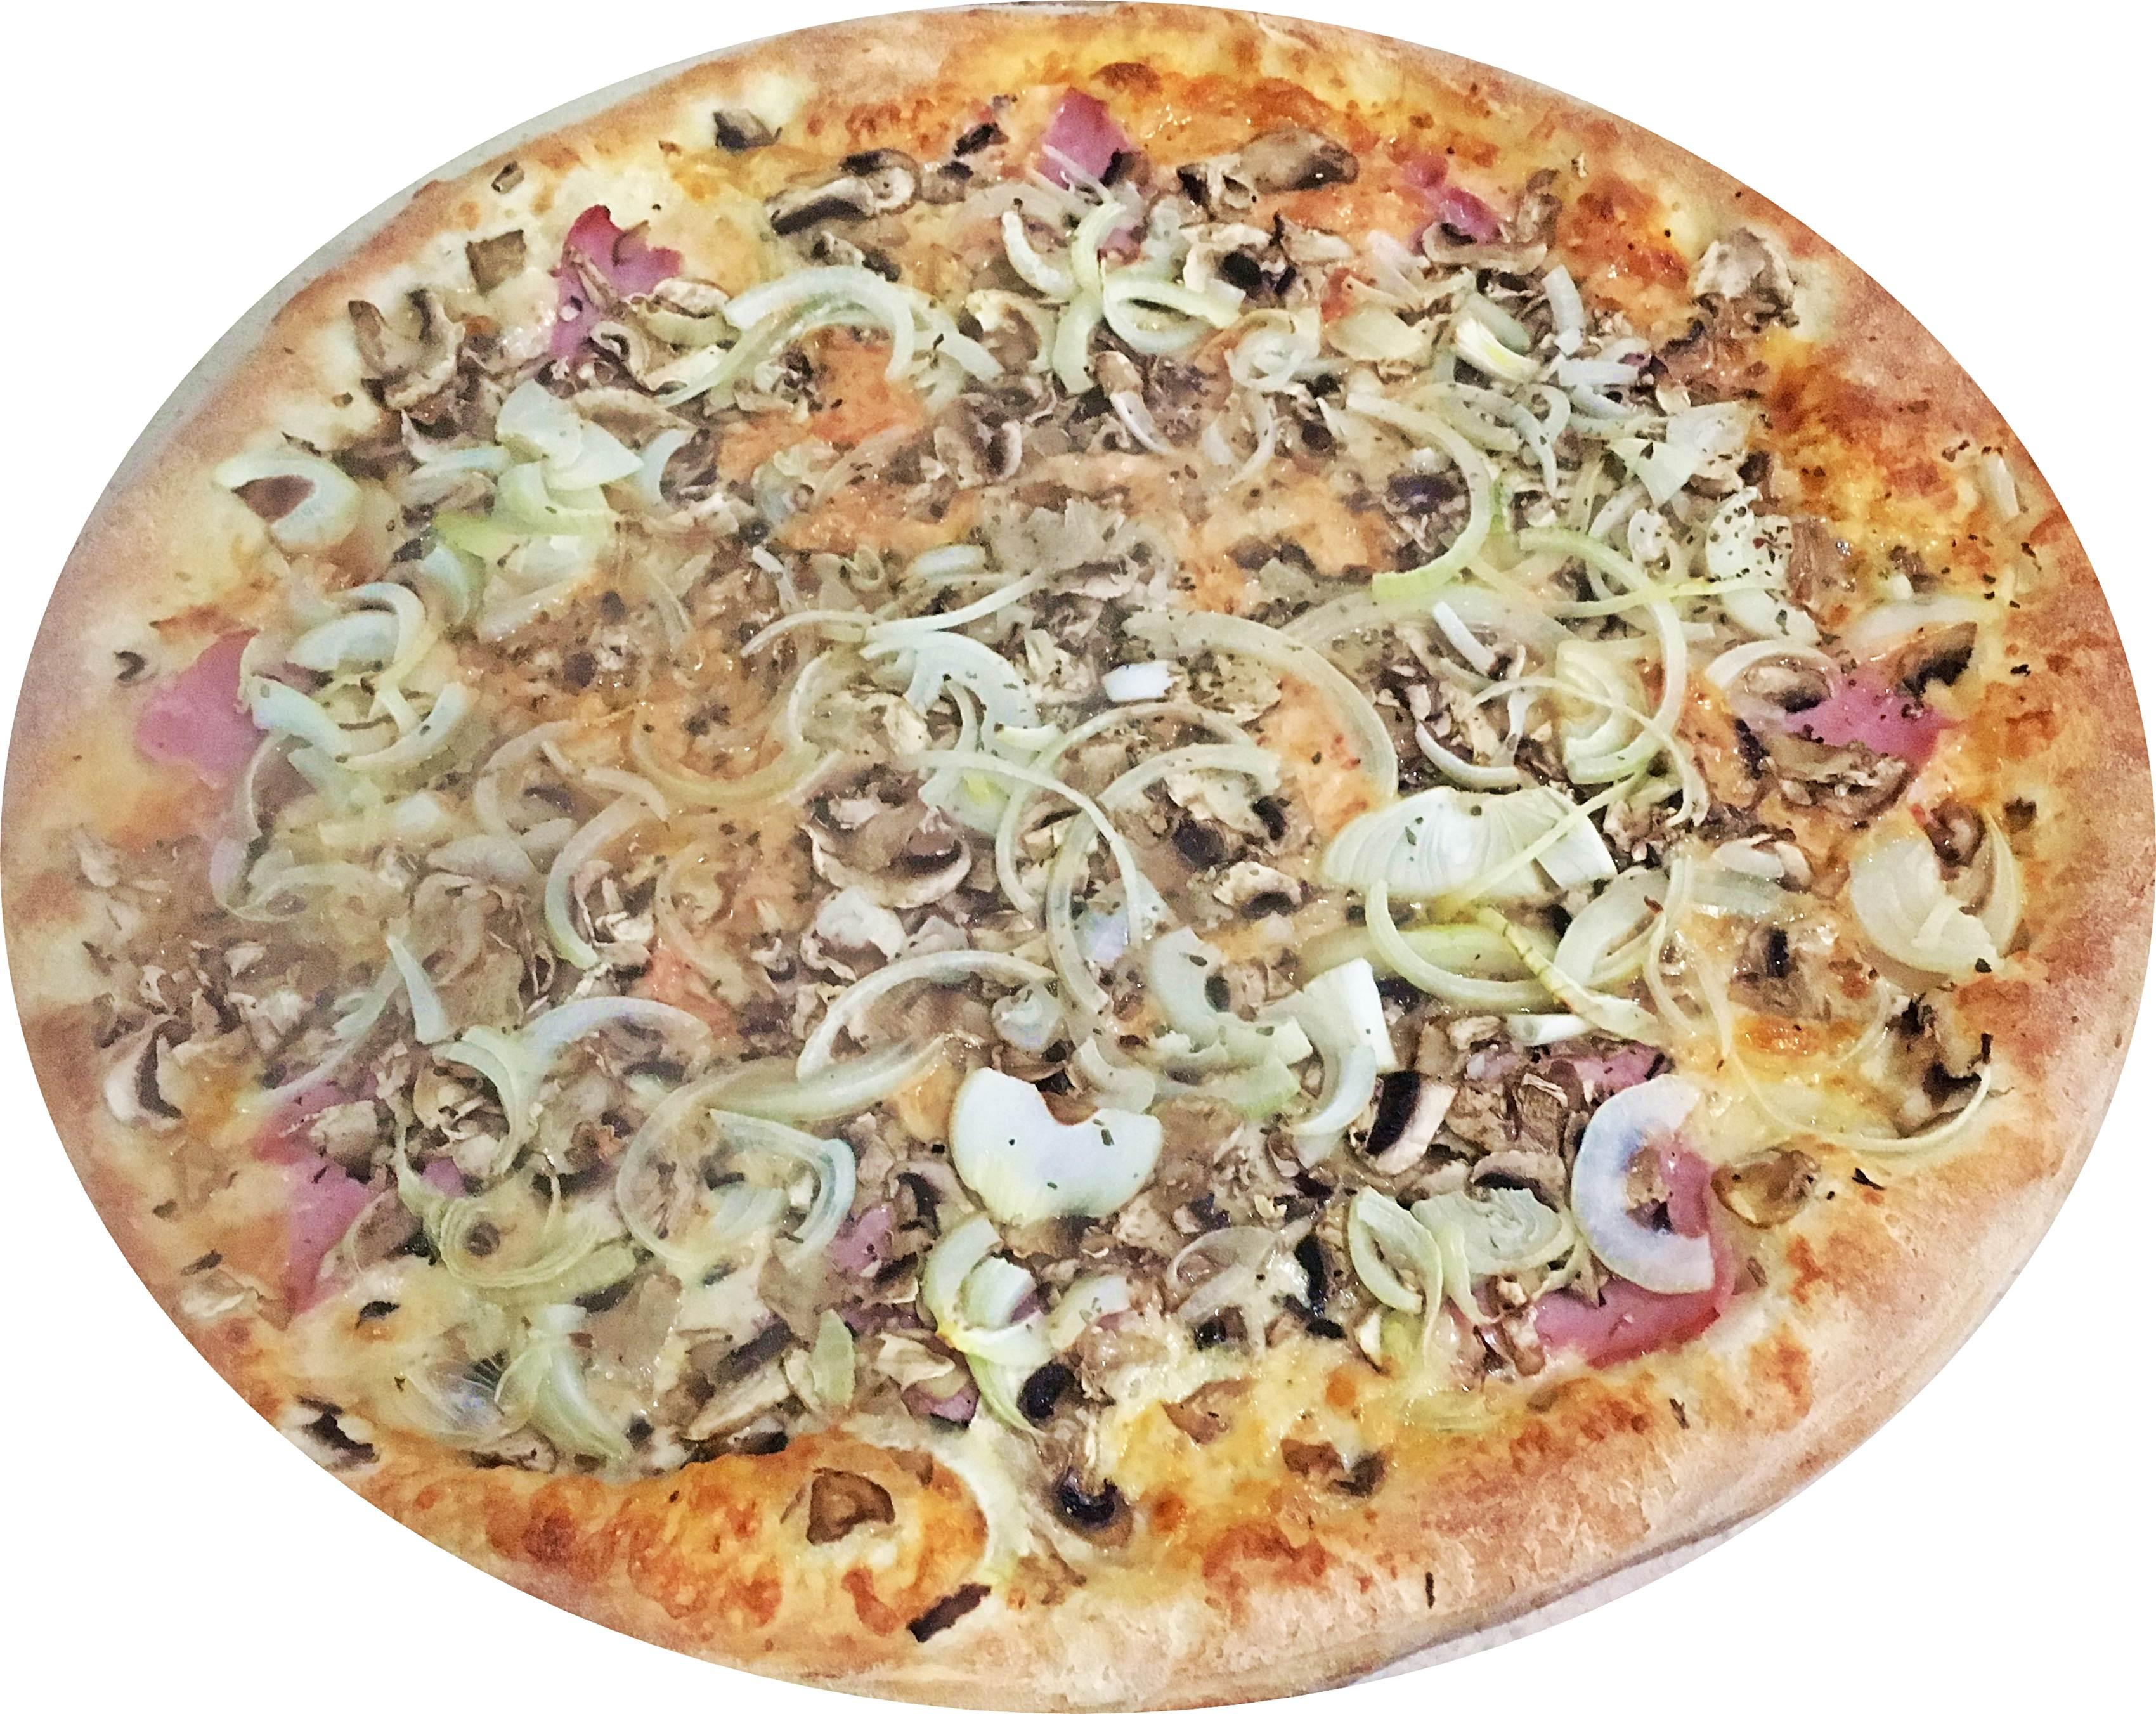 Pizza CARPIGIANI - Antonio Kasprzaka Łódź